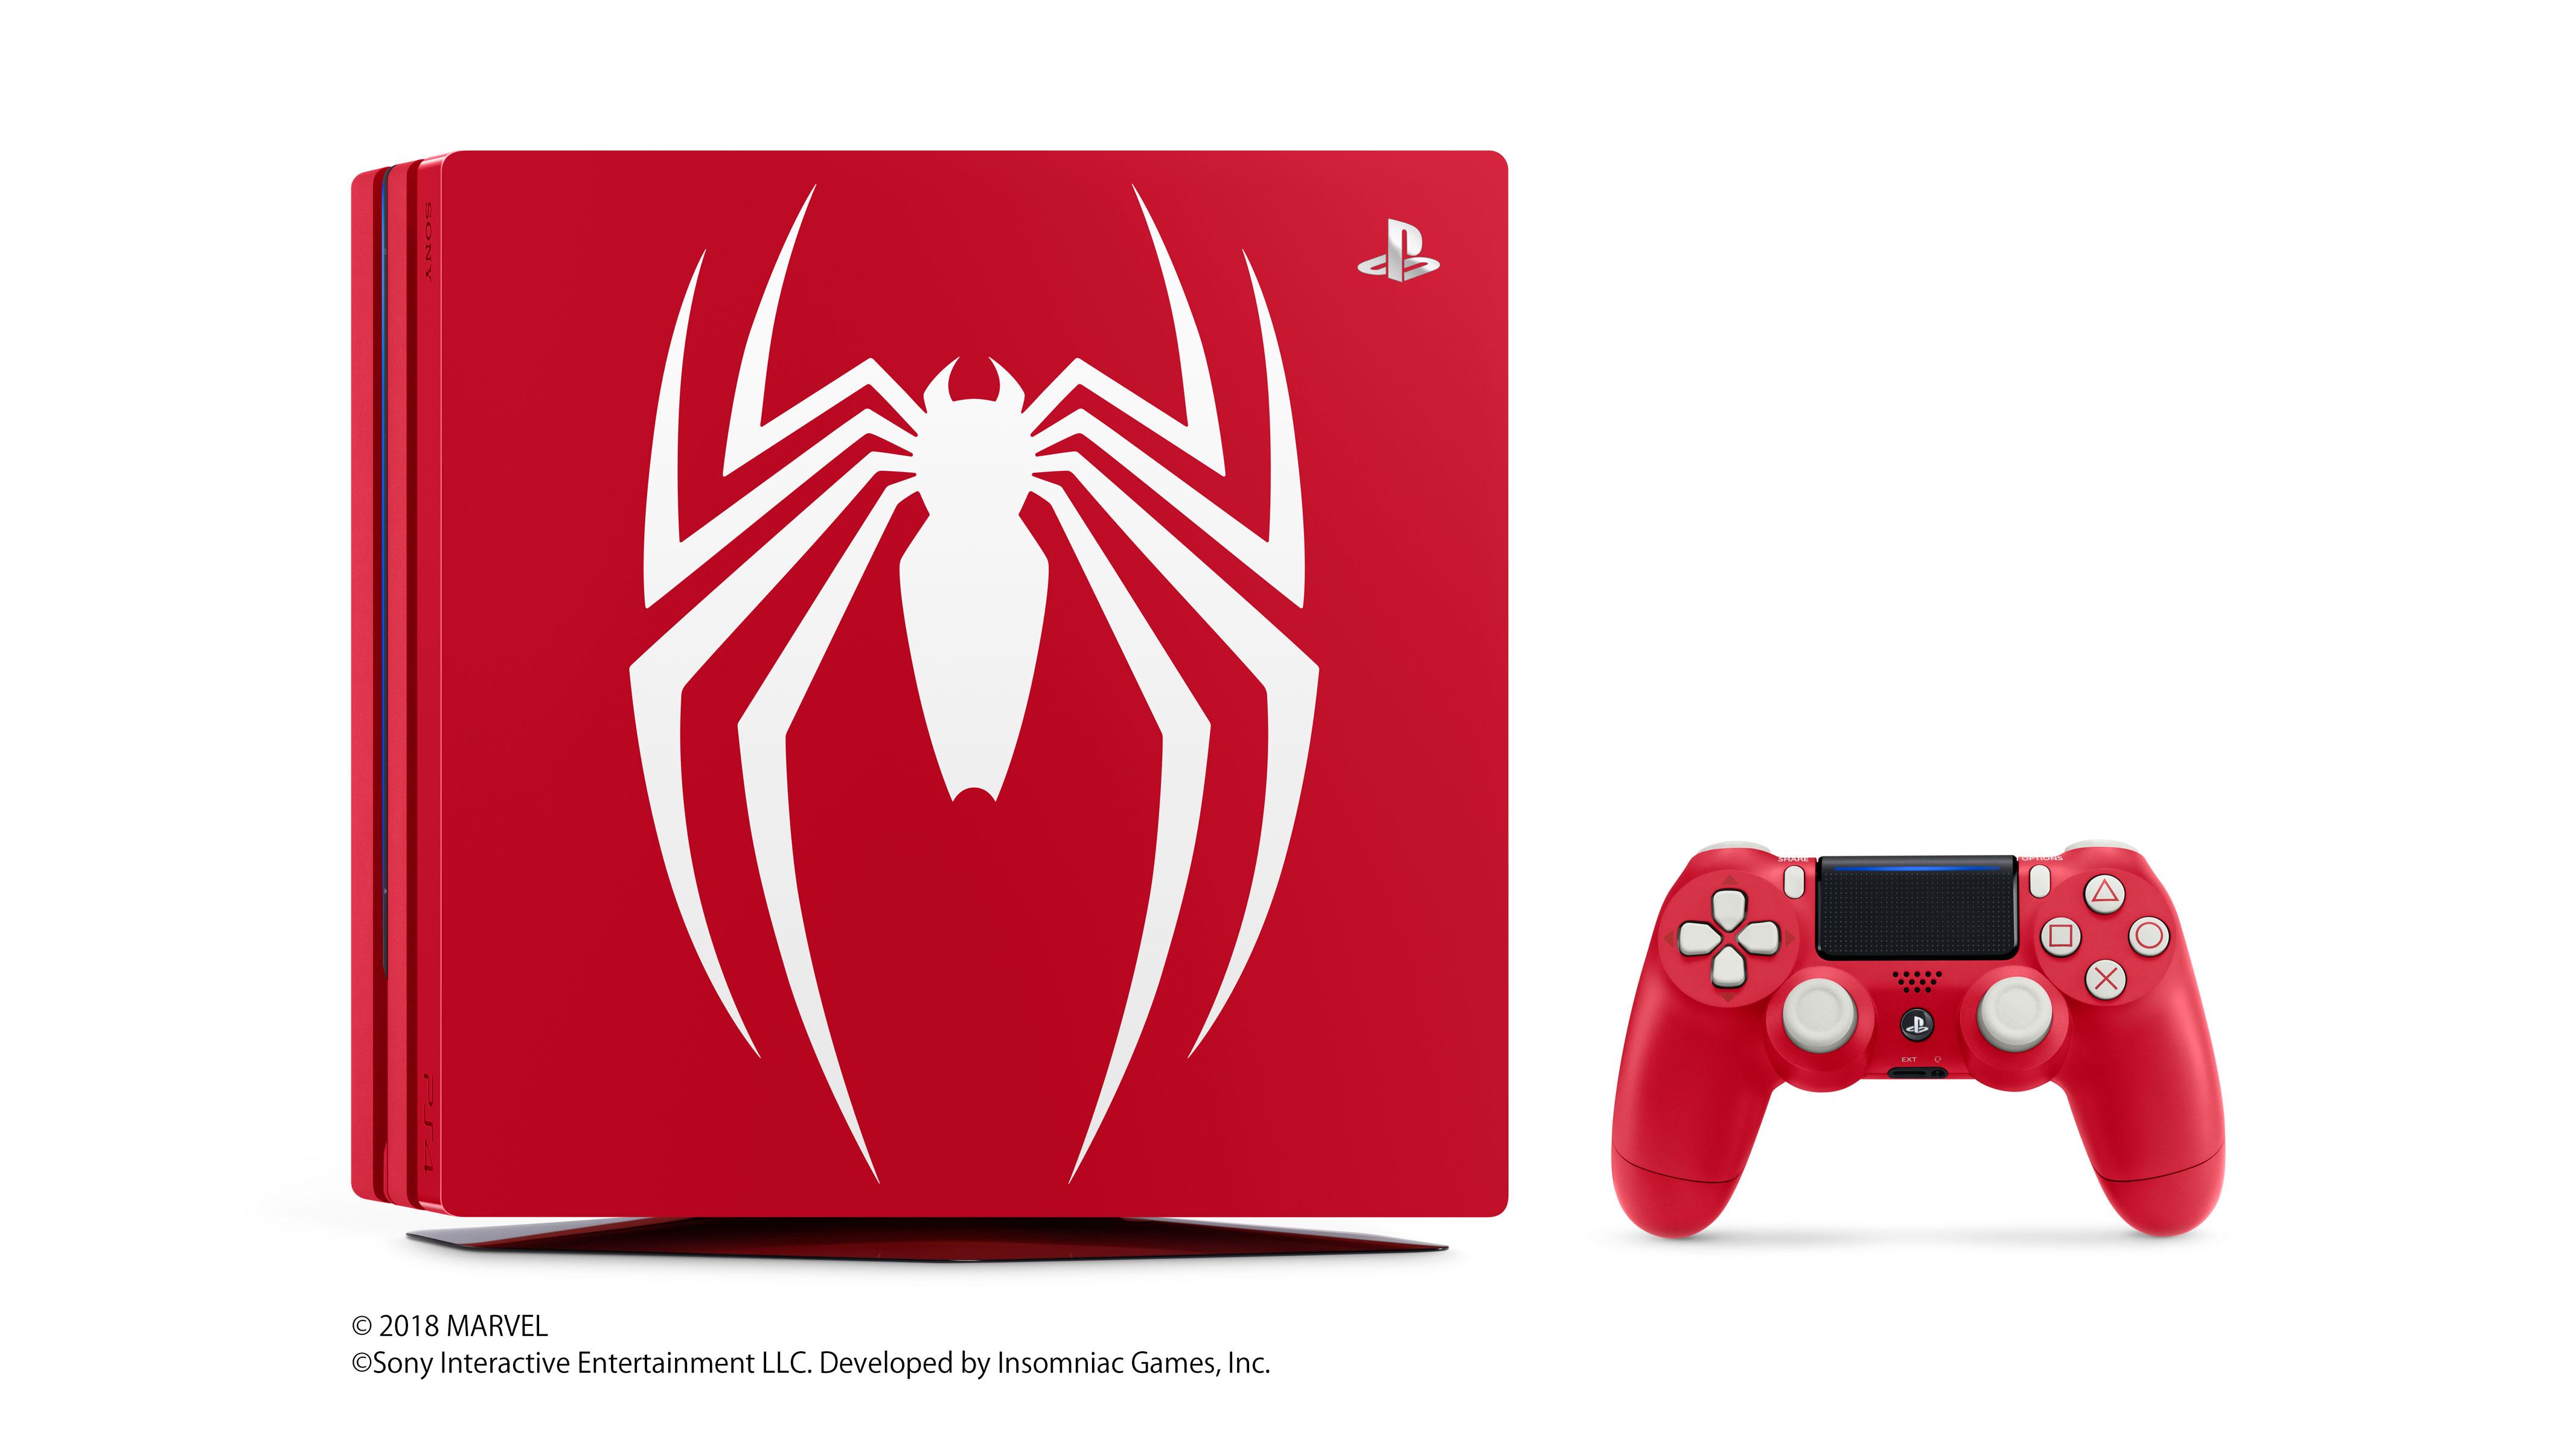 Marvel's Spider-Man 23/07/18 01